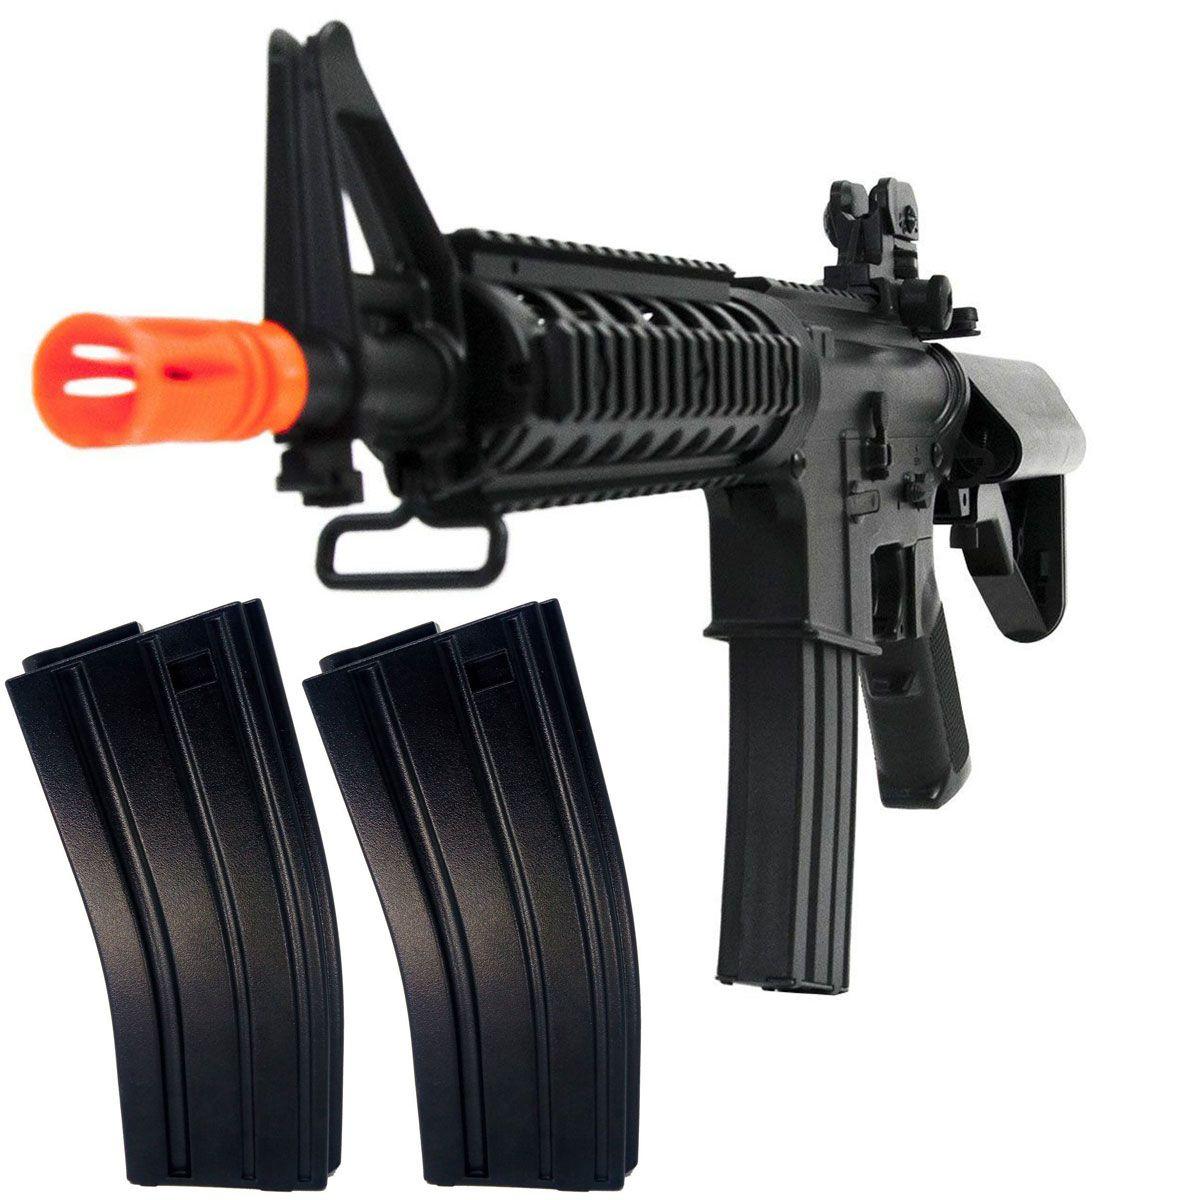 Kit Rifle Cyma M41A + 2 Mag Extra